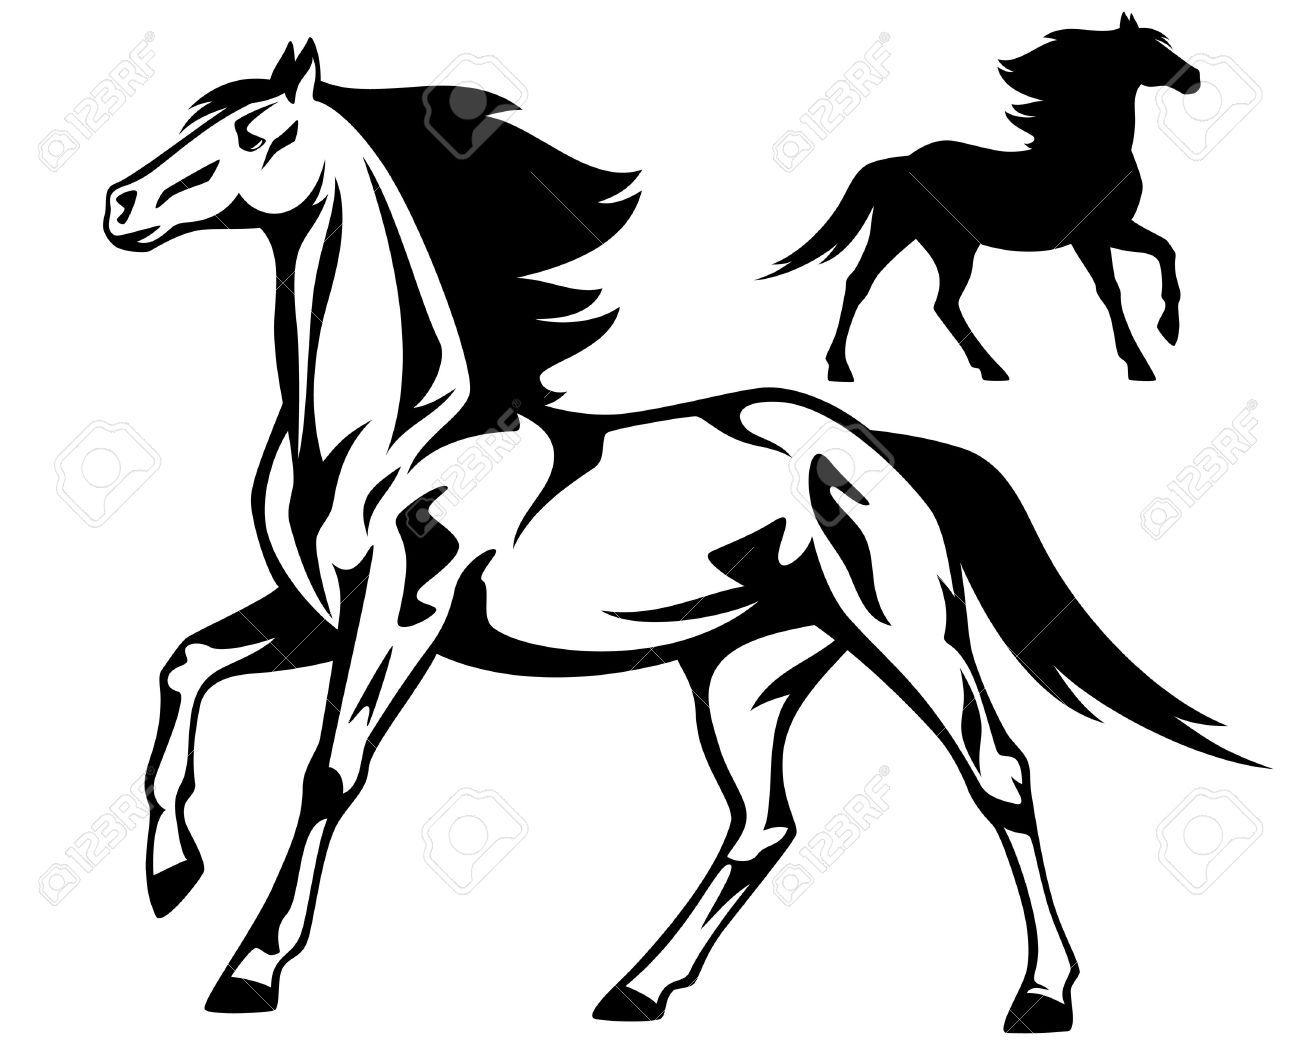 Running Horse Black And White Vector Outline And Silhouette Black And White Drawing Running Horses Black And White Illustration